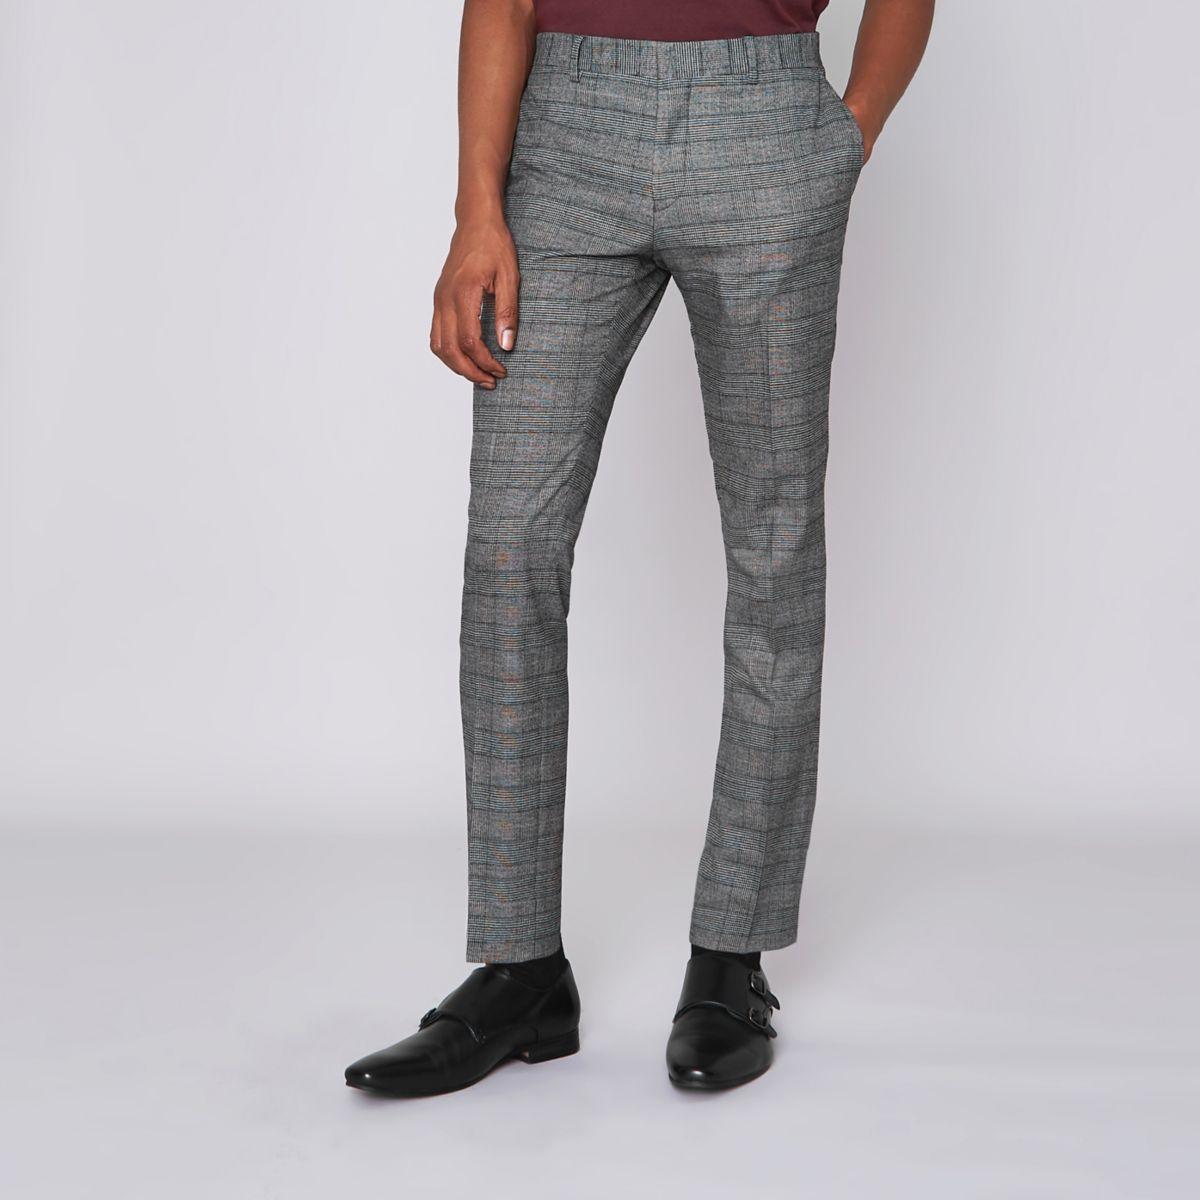 Bruine geruite ultraskinny pantalon